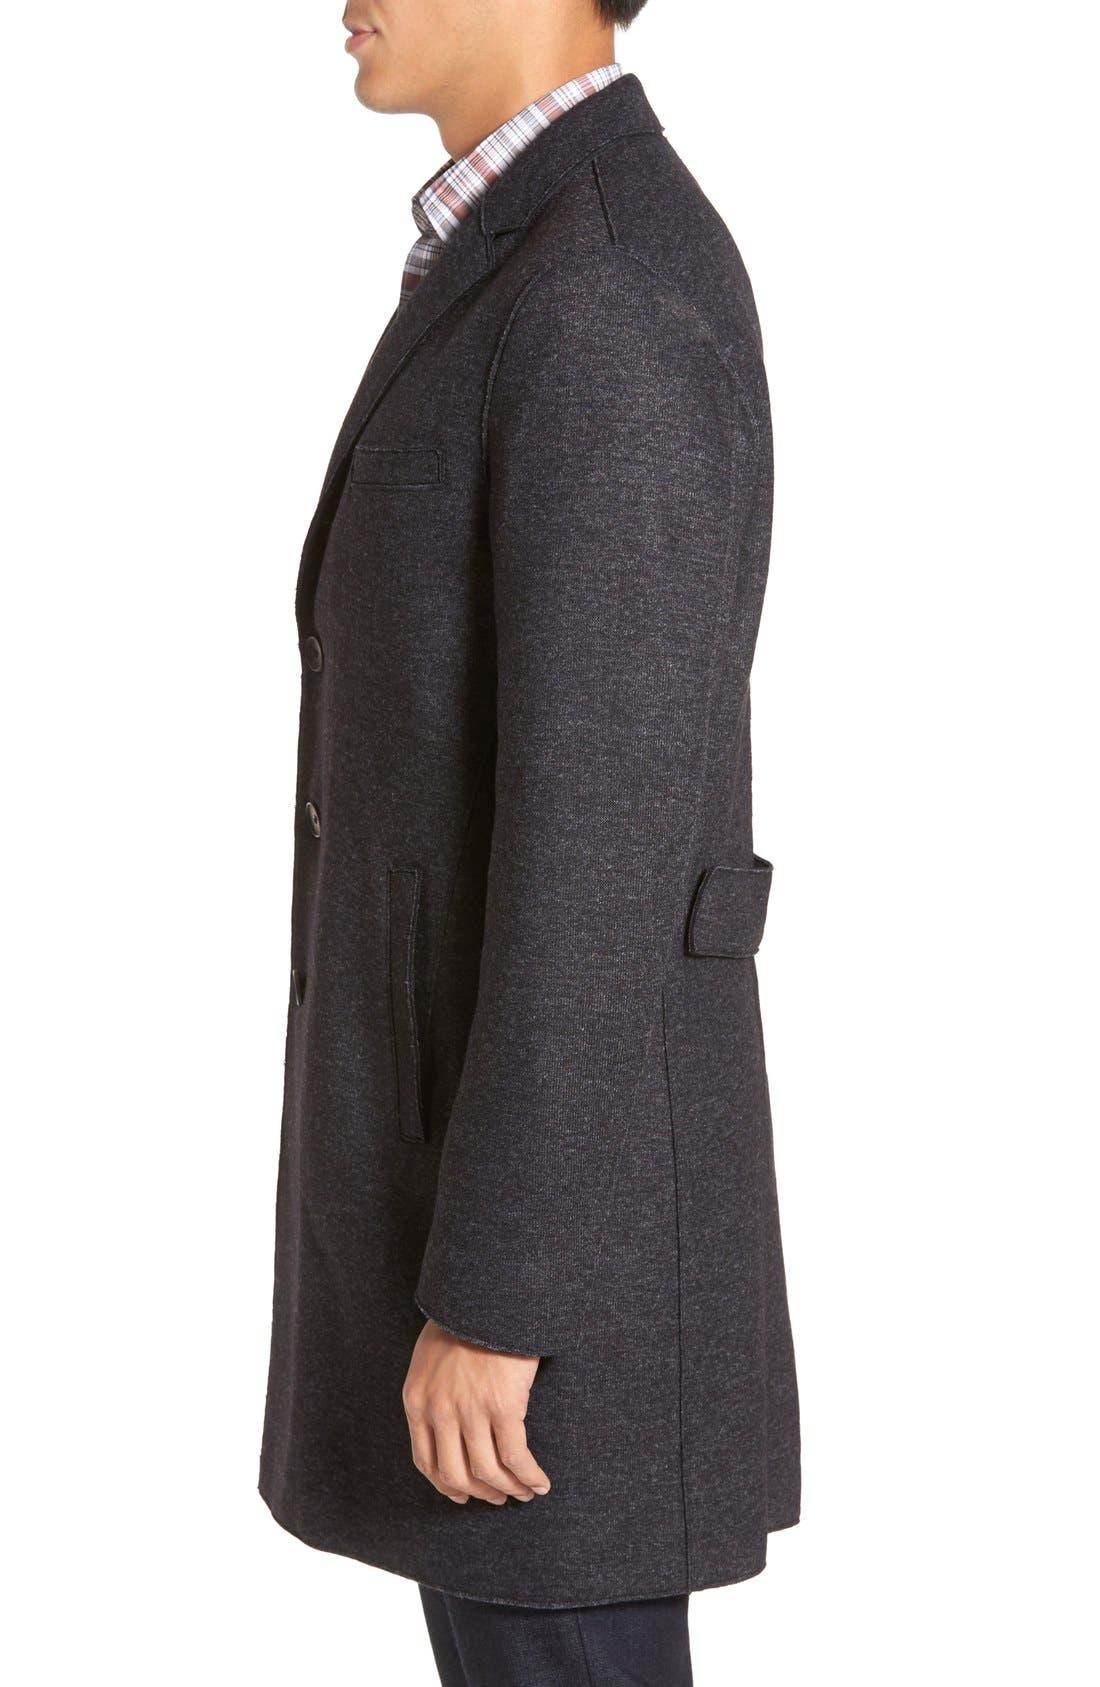 BOSS 'Shawn' Wool Blend Overcoat,                             Alternate thumbnail 3, color,                             402